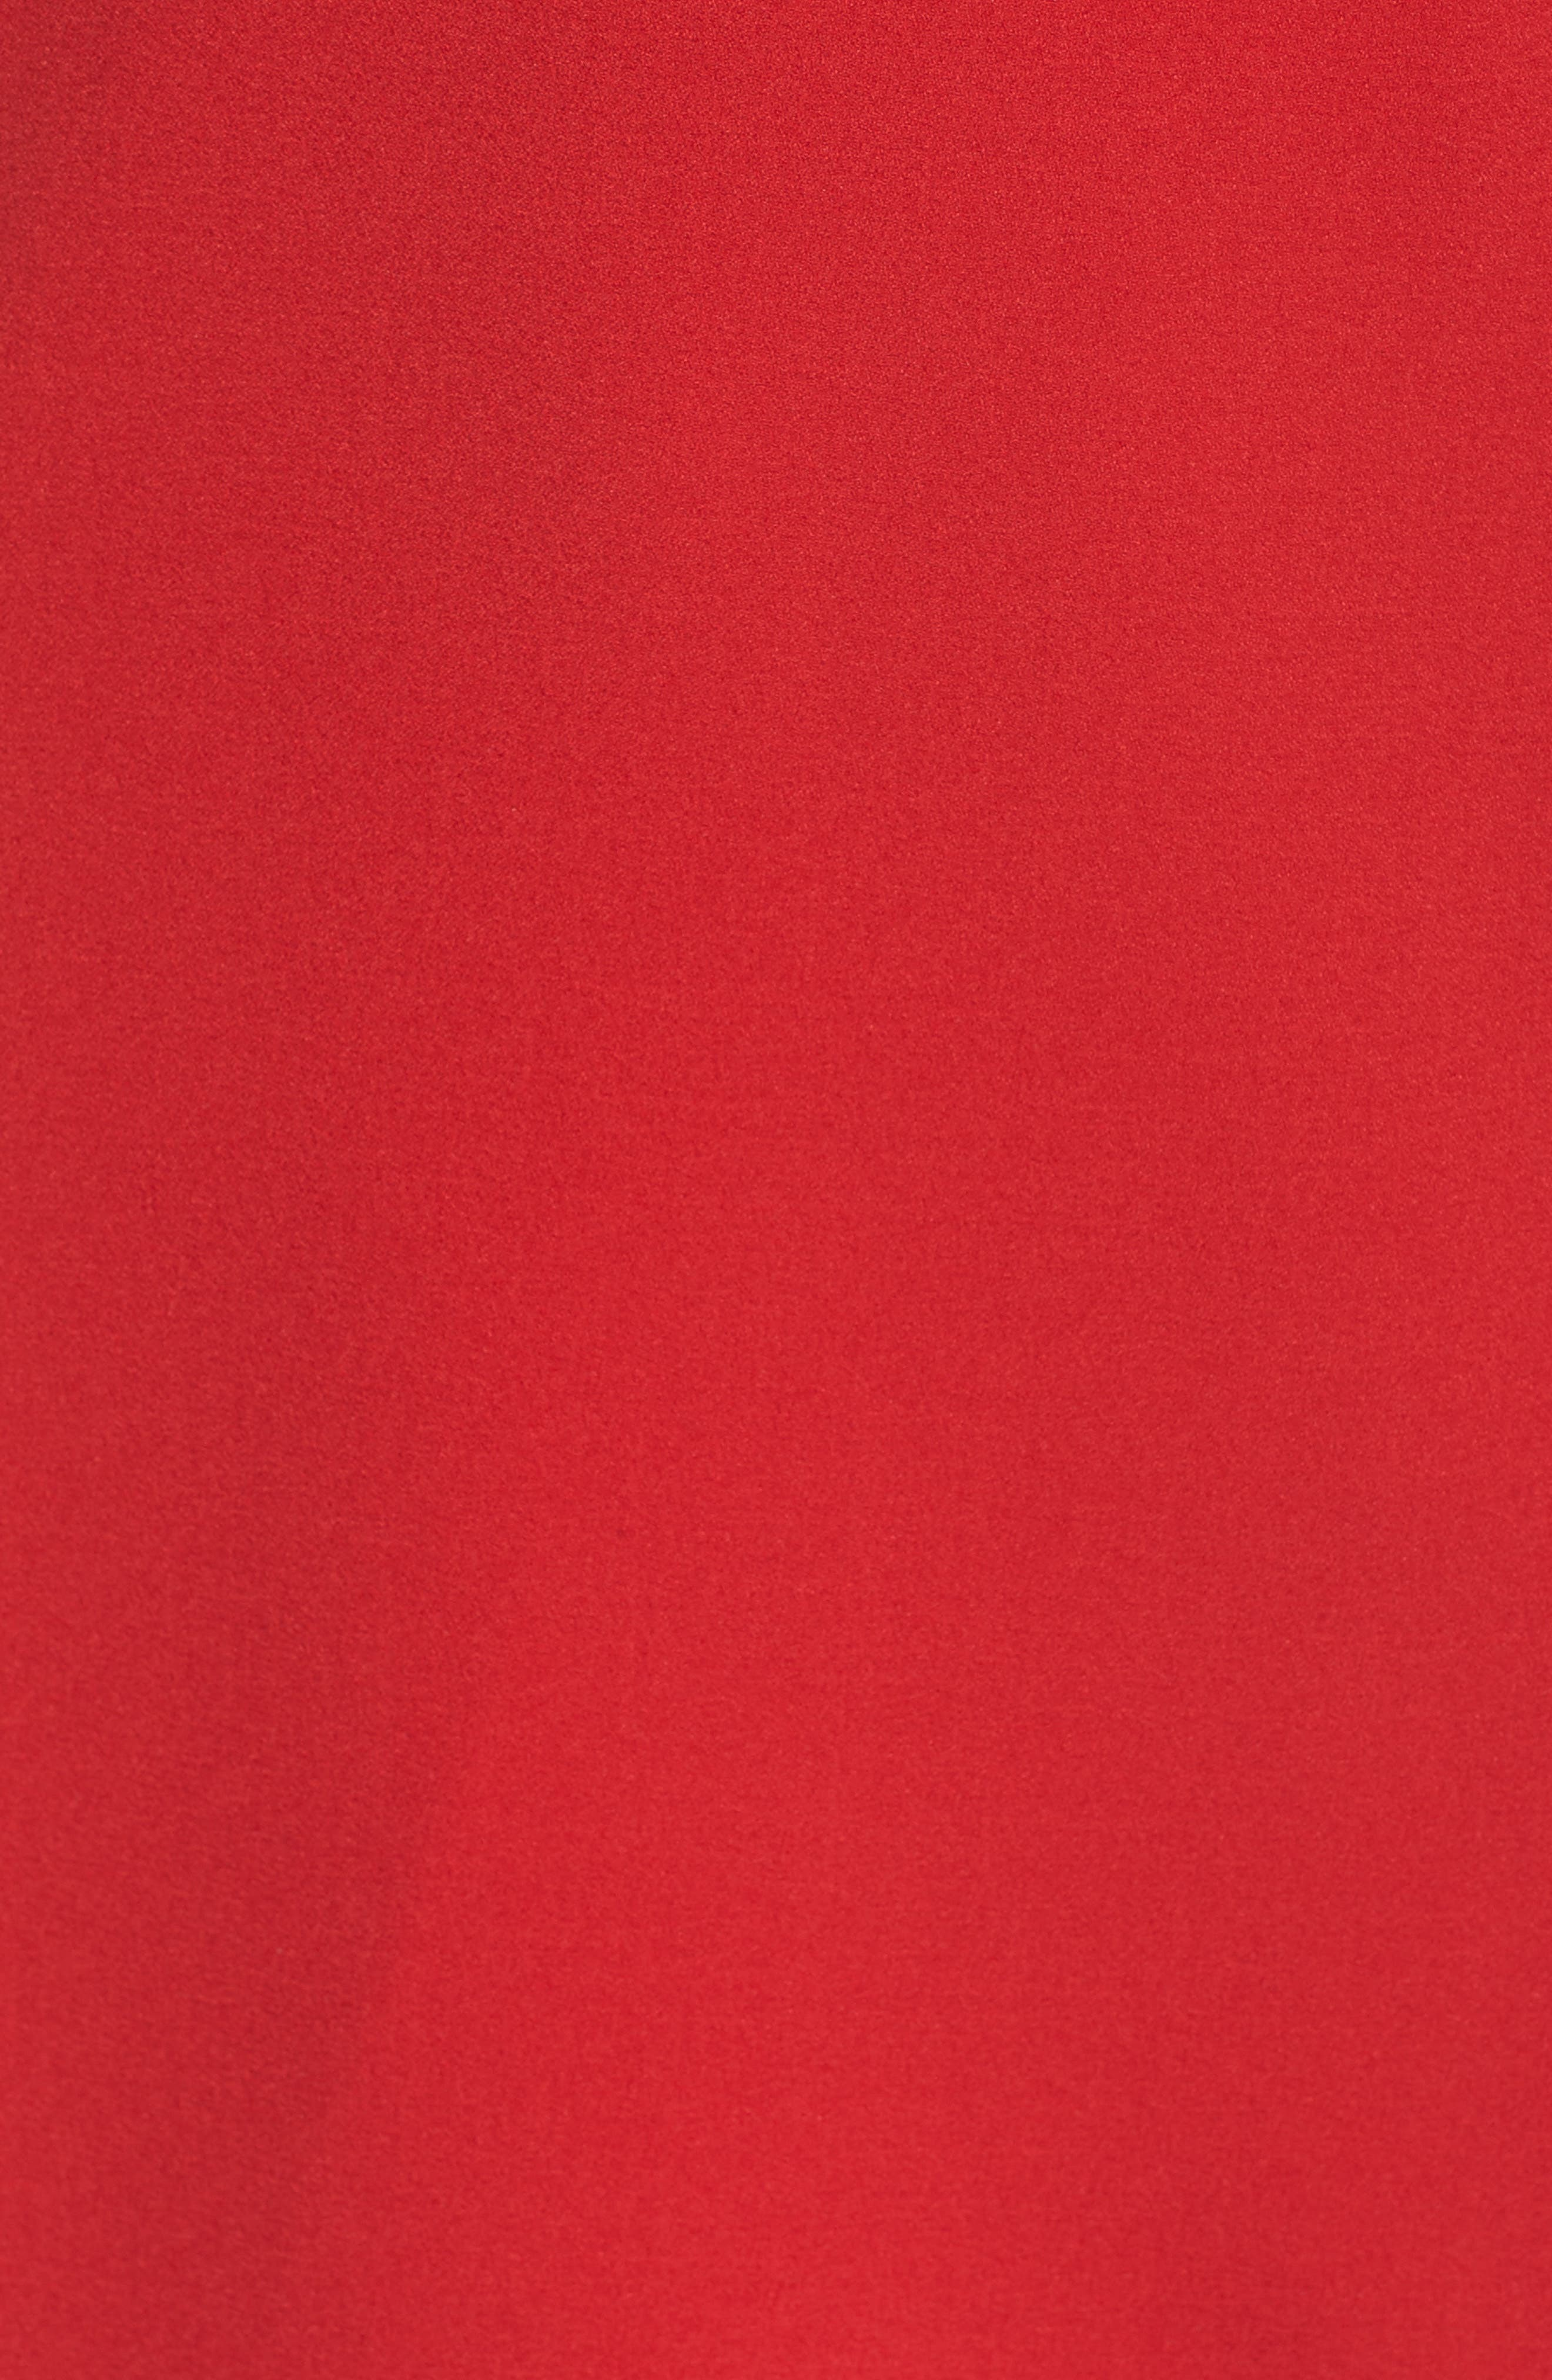 VINCE CAMUTO, Halter Tie Neck A-Line Dress, Alternate thumbnail 7, color, RED